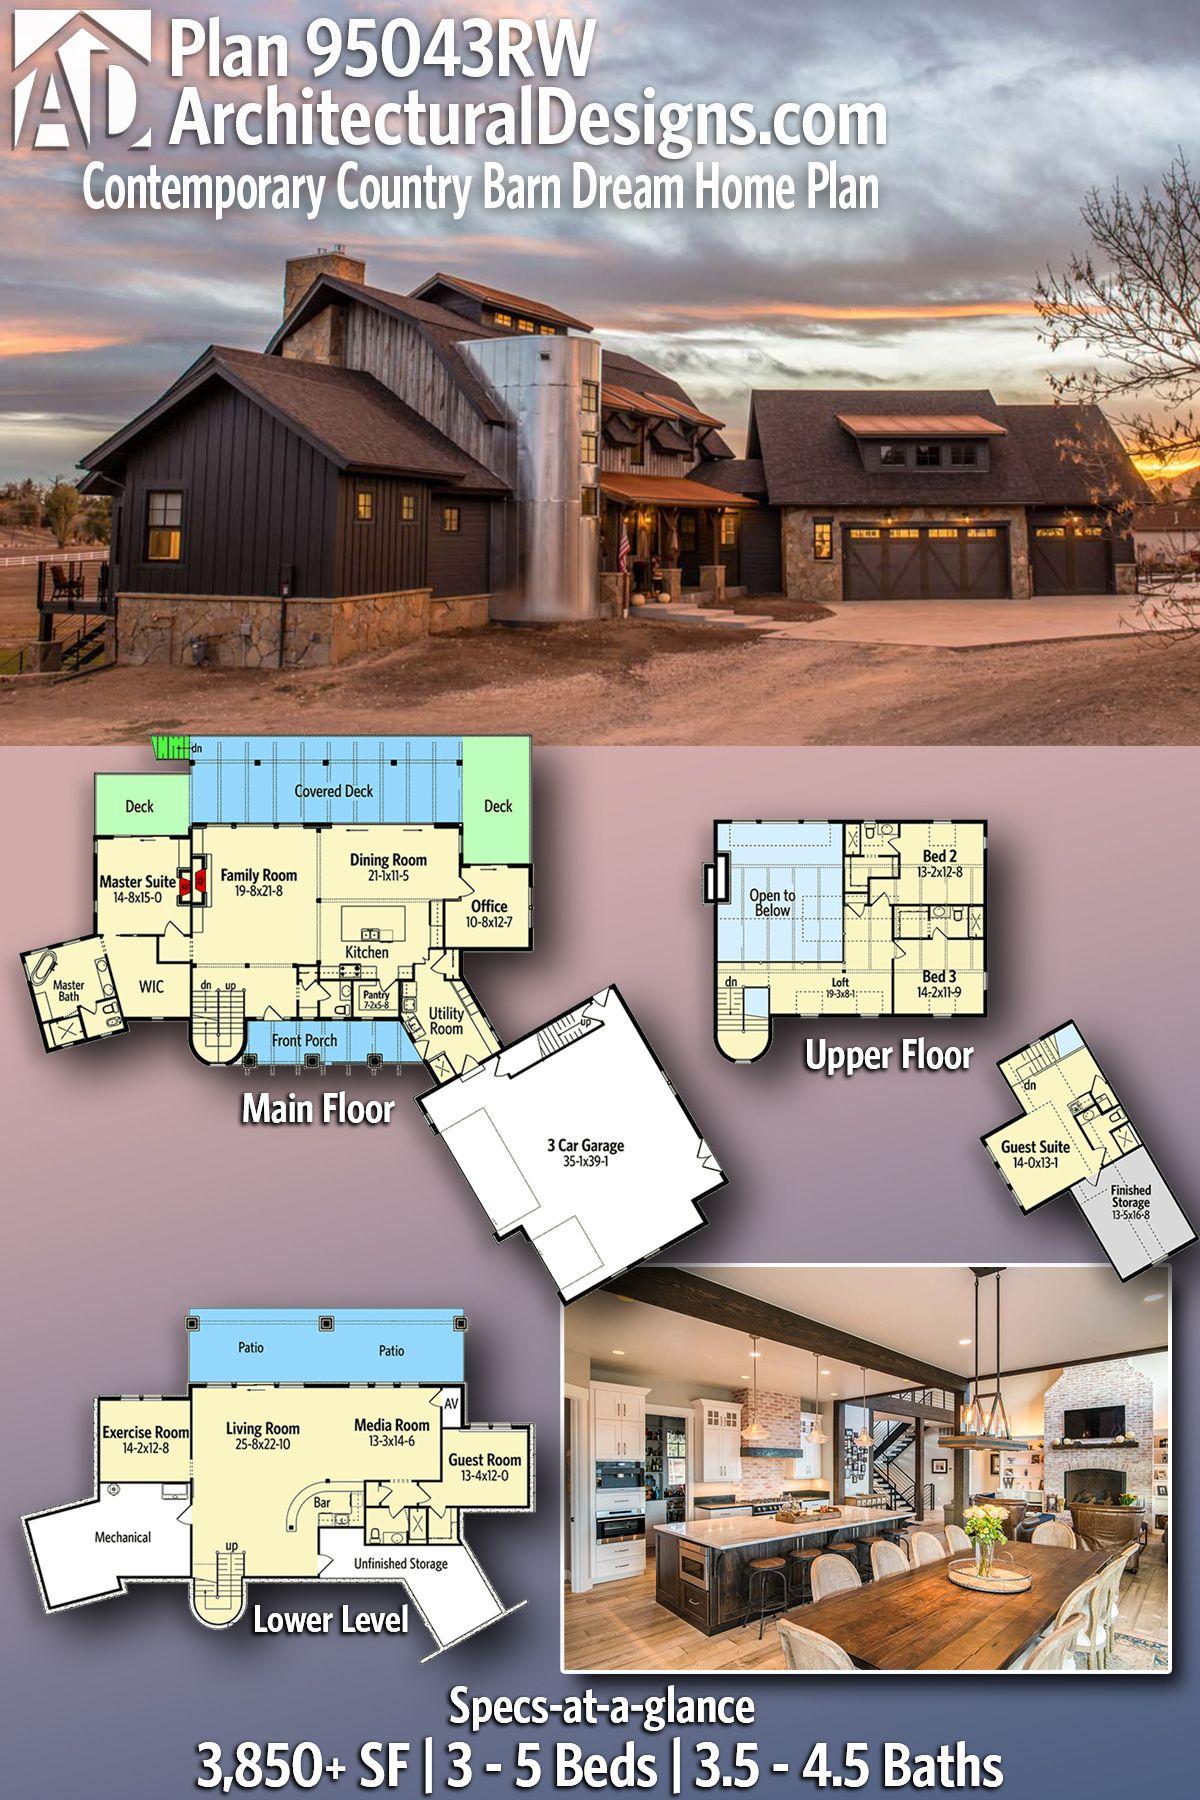 Plan 95043rw Contemporary Country Barn Dream Home Plan In 2020 Dream House Plans House Plans New House Plans